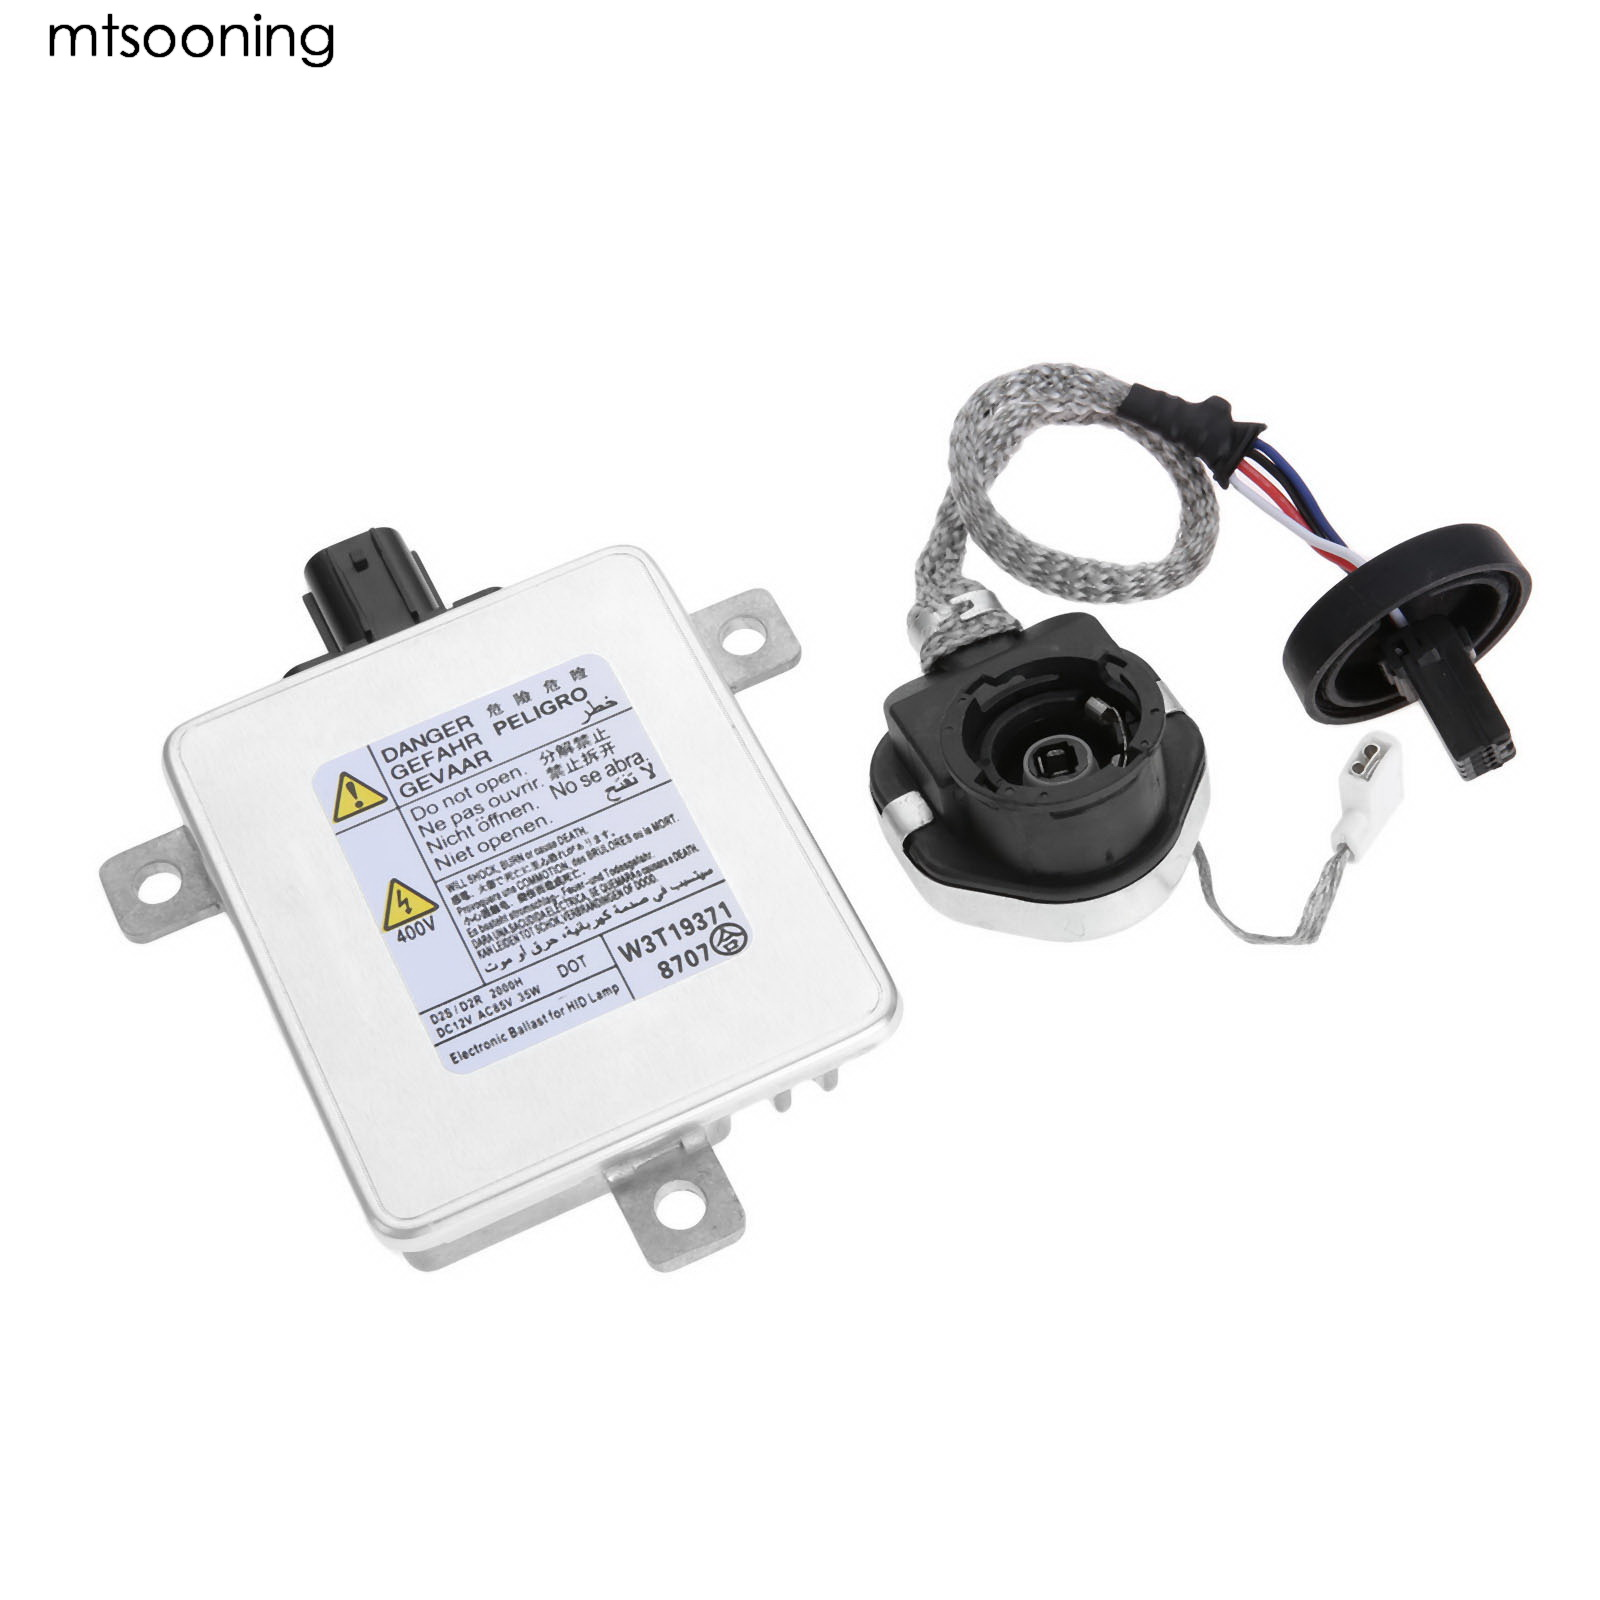 mtsooning Xenon Headlight Ballast Control Module Unit Igniter W3T19371 For 2004-2014 ACURA TSX HONDA ODYSSEY MAZDA MITSUBISHI tsxpcx3030 is for tsx premium 57 tsx micro 37 tsx nano 07 tsx naza 08 and twido plc programming with master slave switch